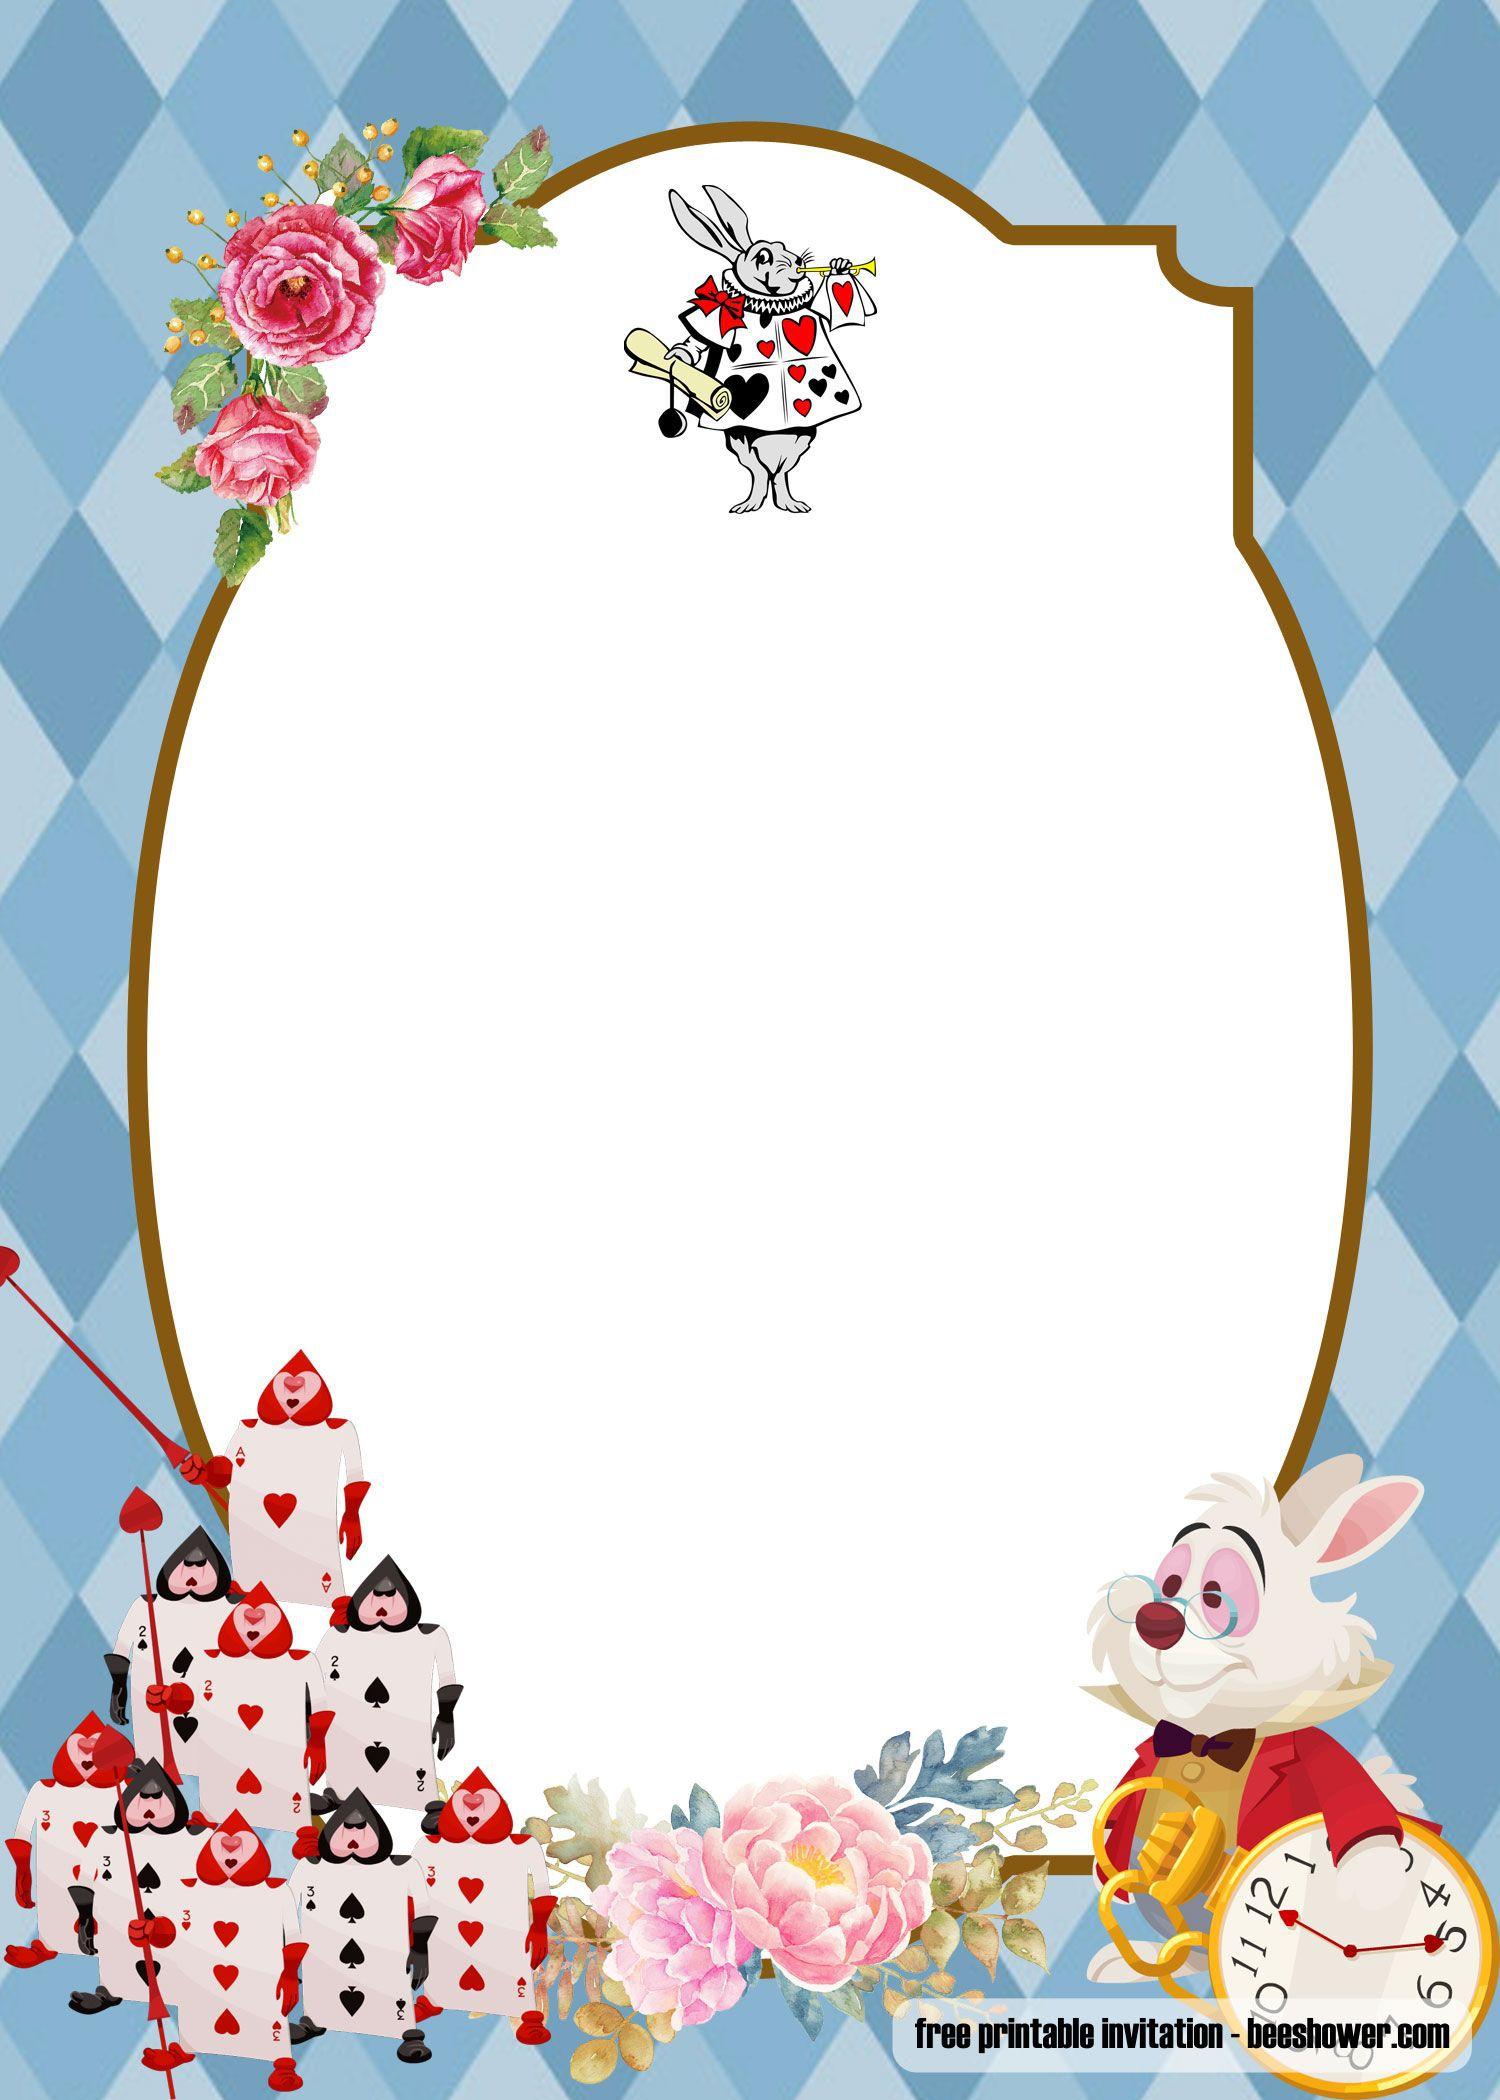 006 Unbelievable Alice In Wonderland Invite Template High Def  Party Invitation FreeFull